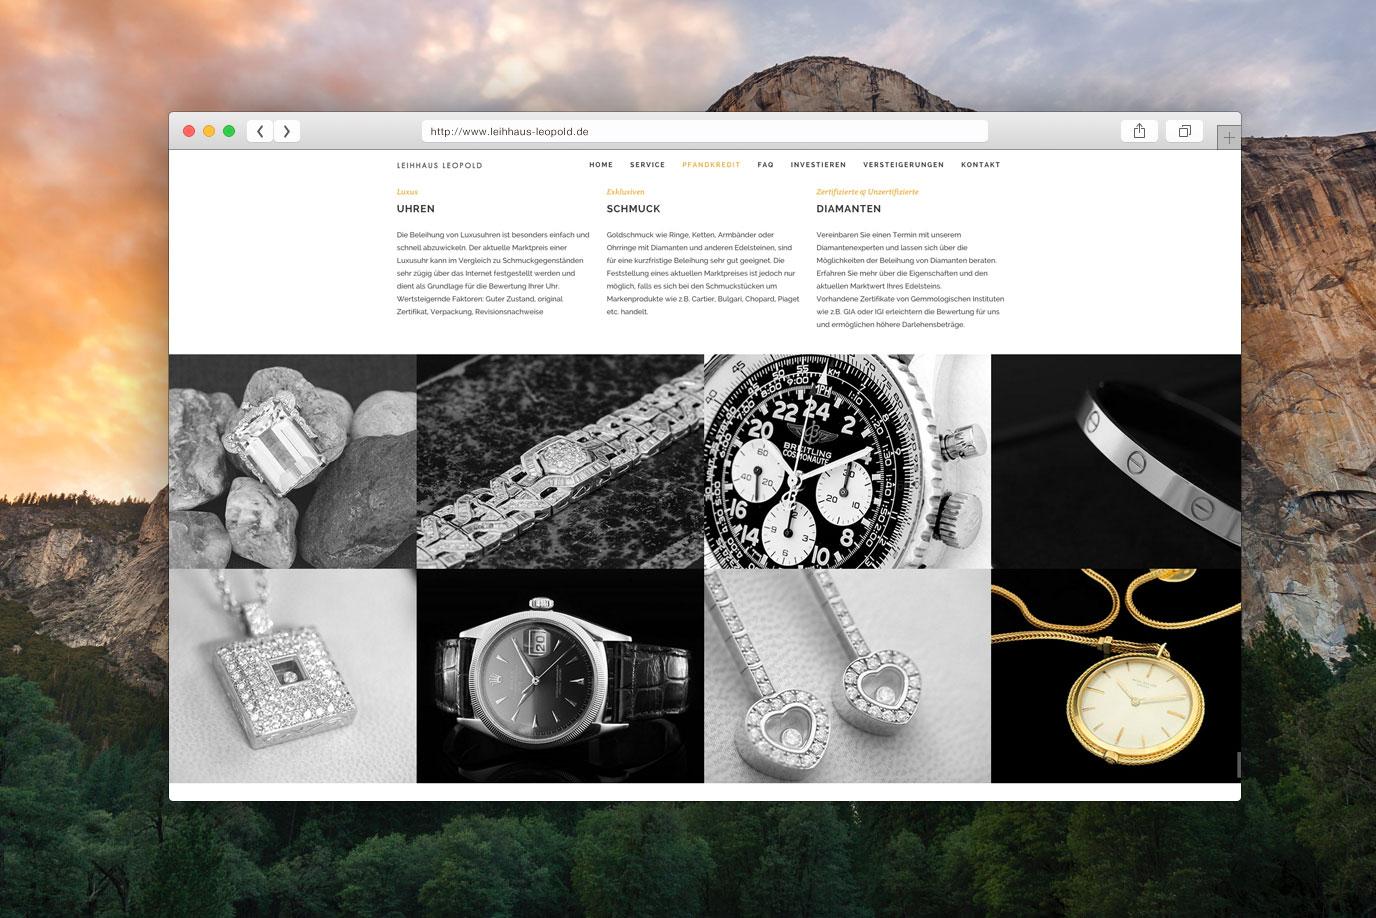 Leihhaus Leopold Berlin Webdesign aus Paderborn